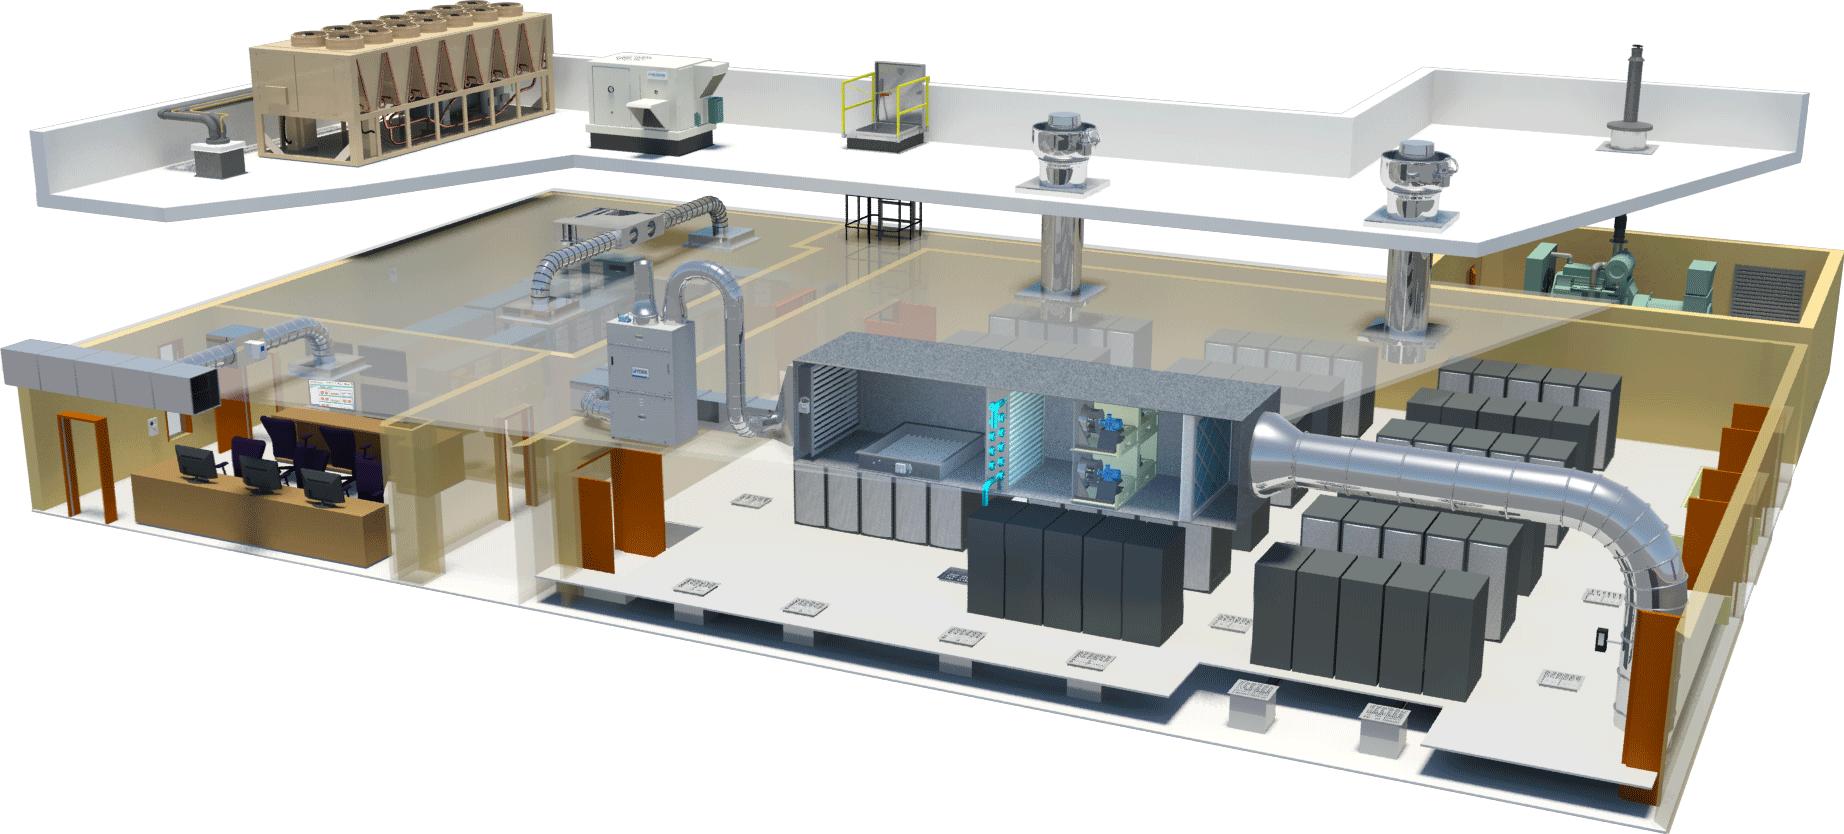 fan coil unit diagram attic fan diagram